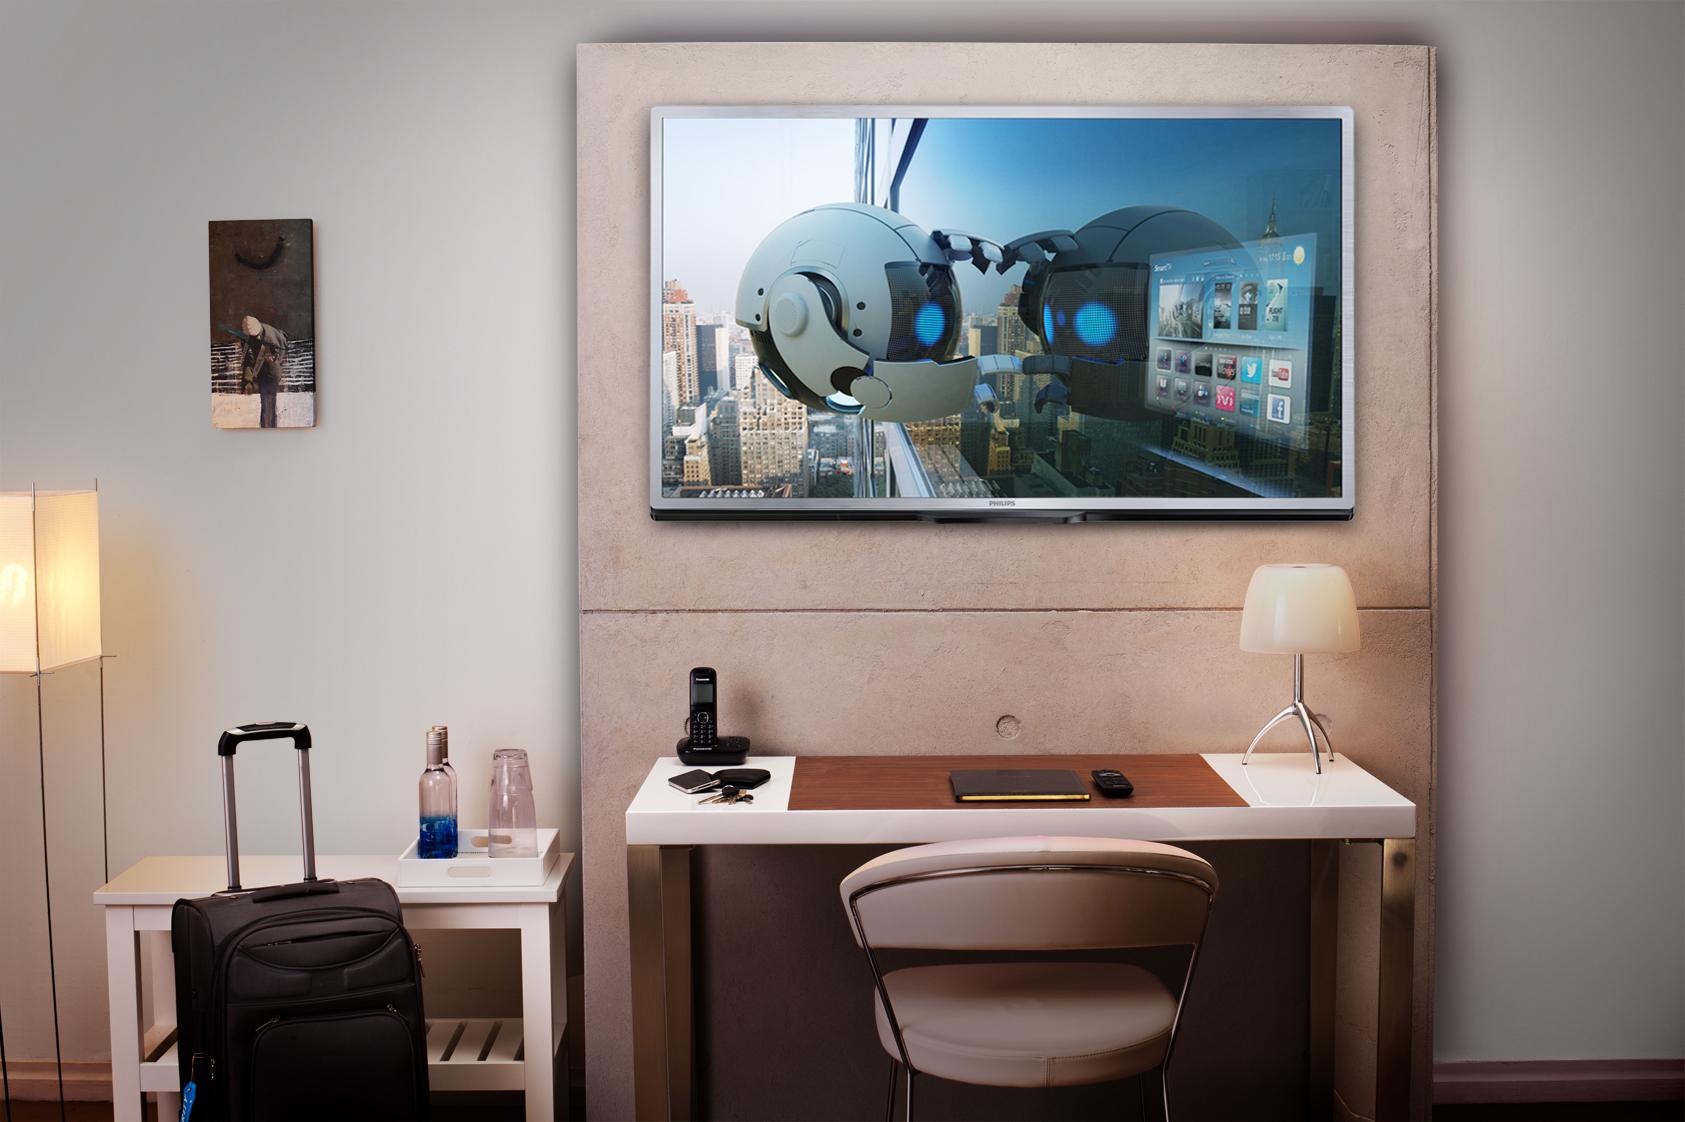 new philips mediasuite hospitality tvs offer dedicated. Black Bedroom Furniture Sets. Home Design Ideas